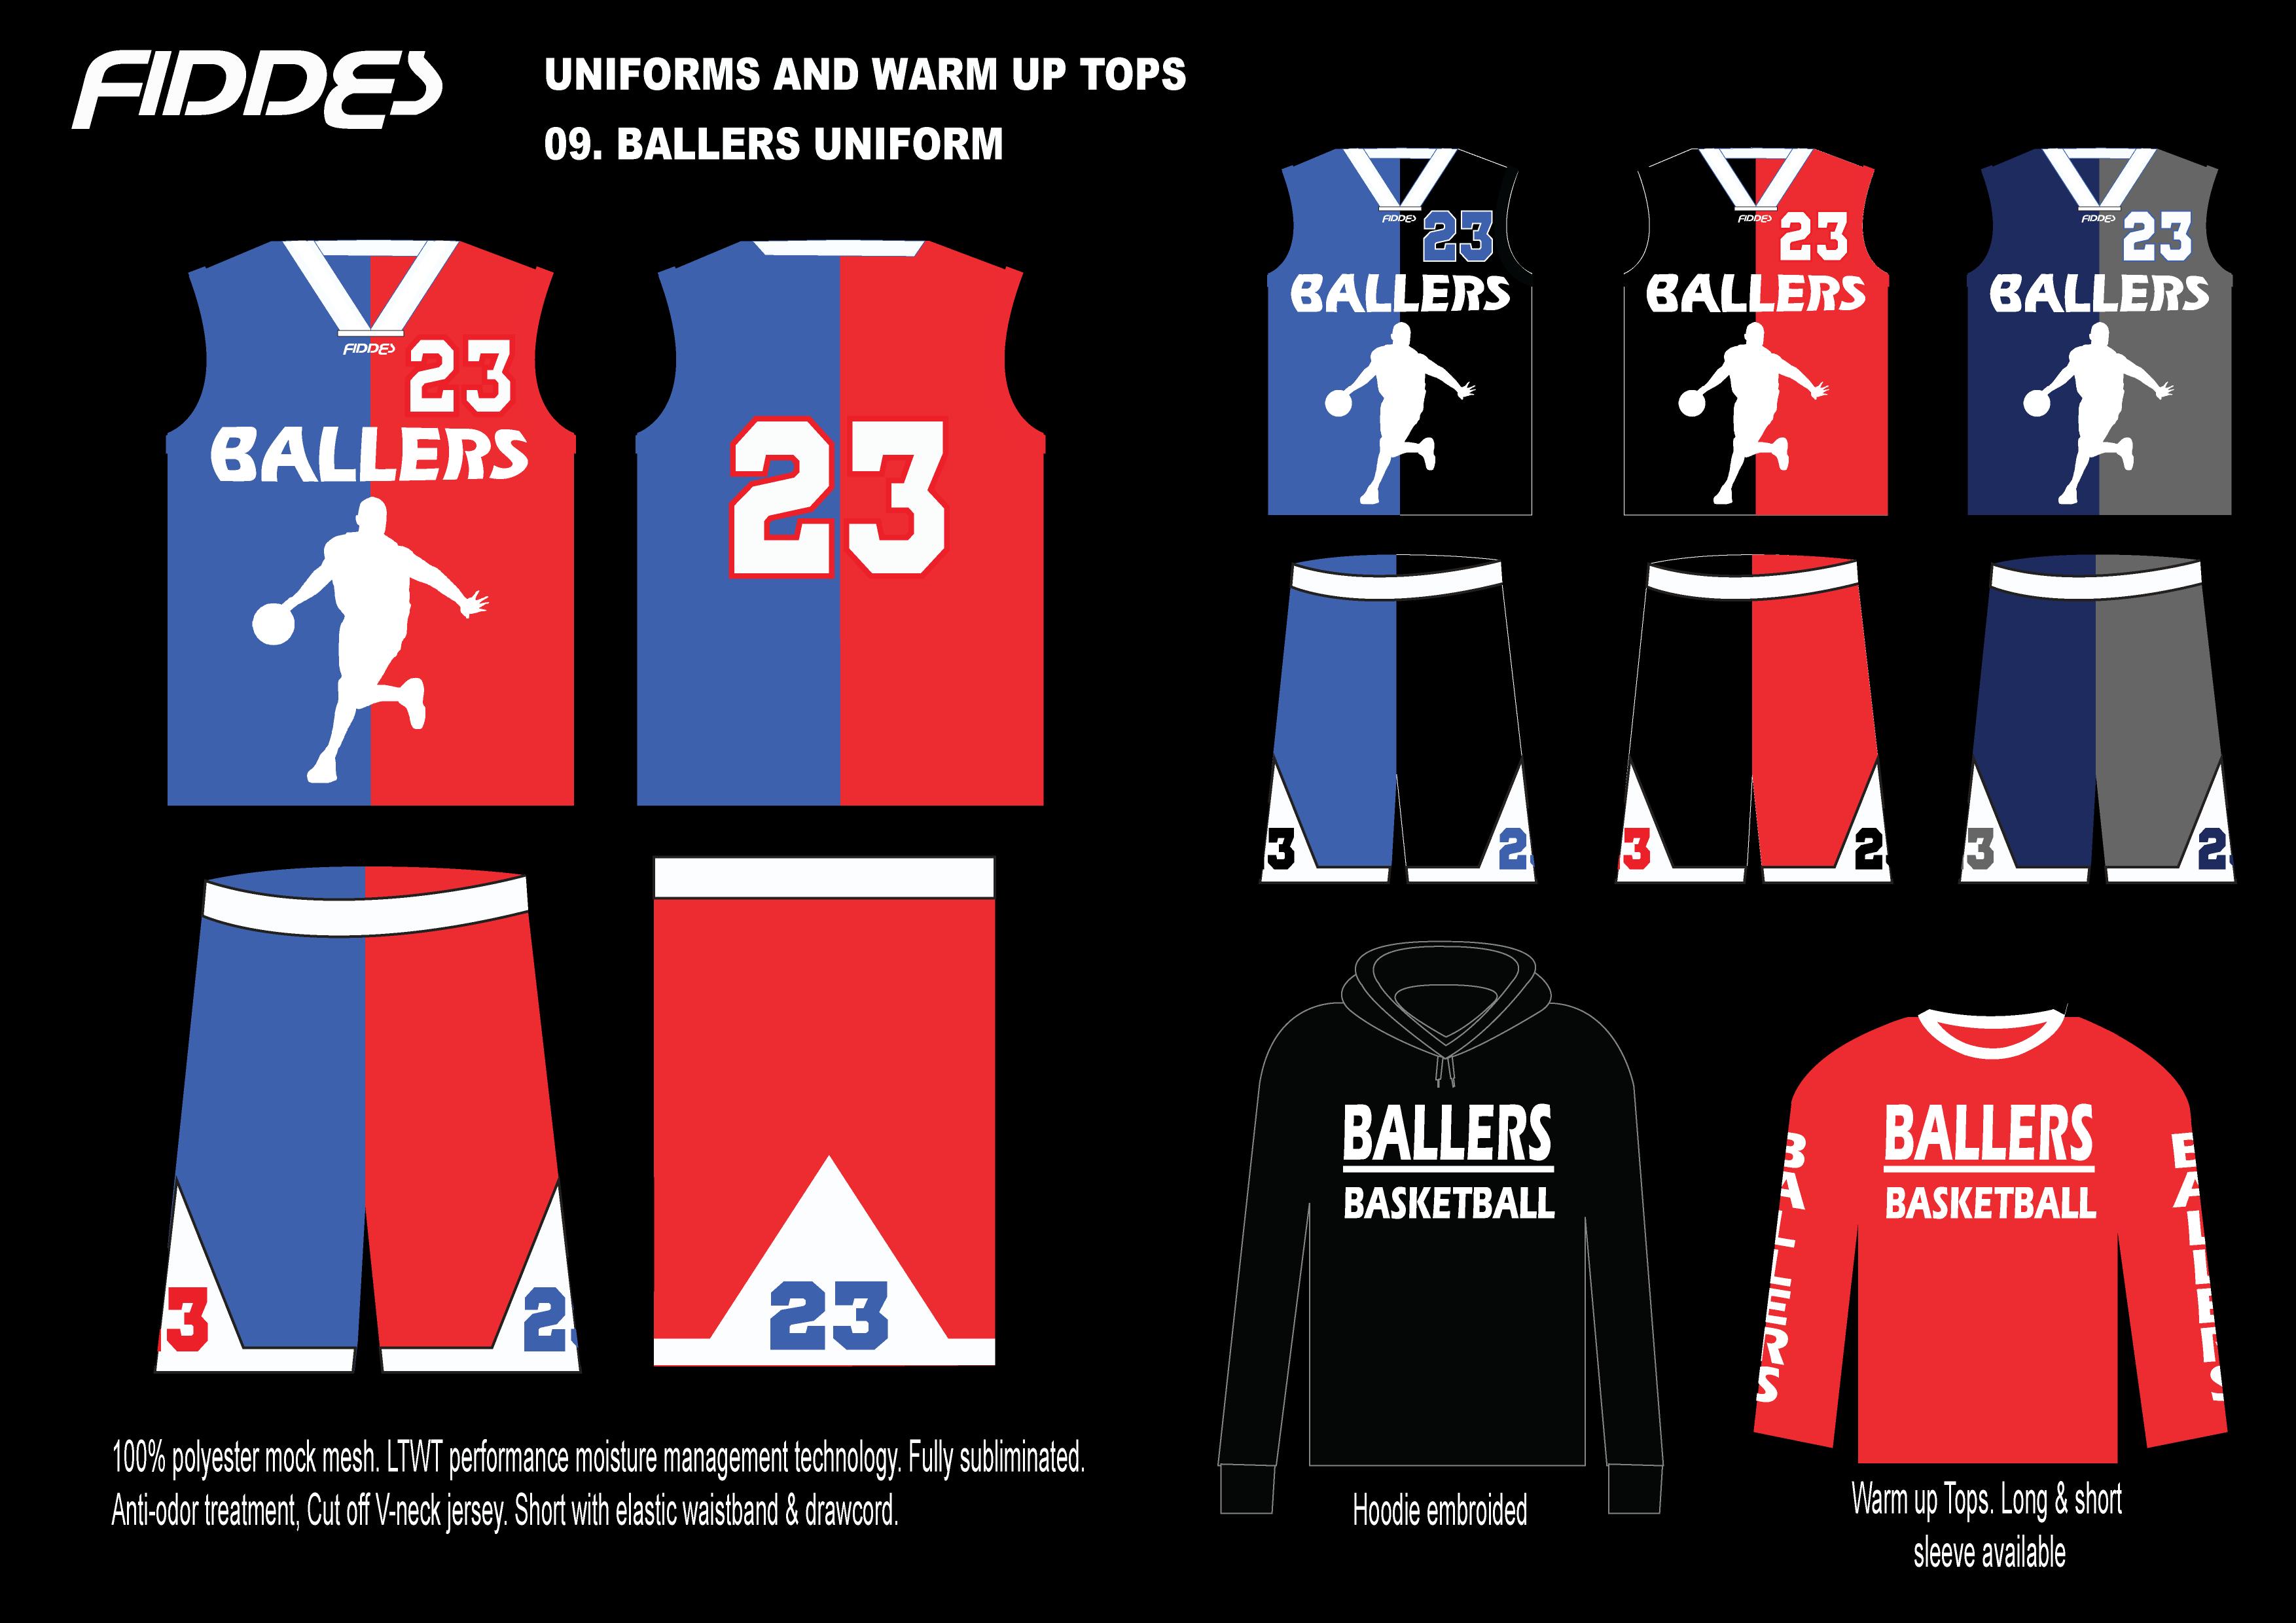 09. Ballers Uniform